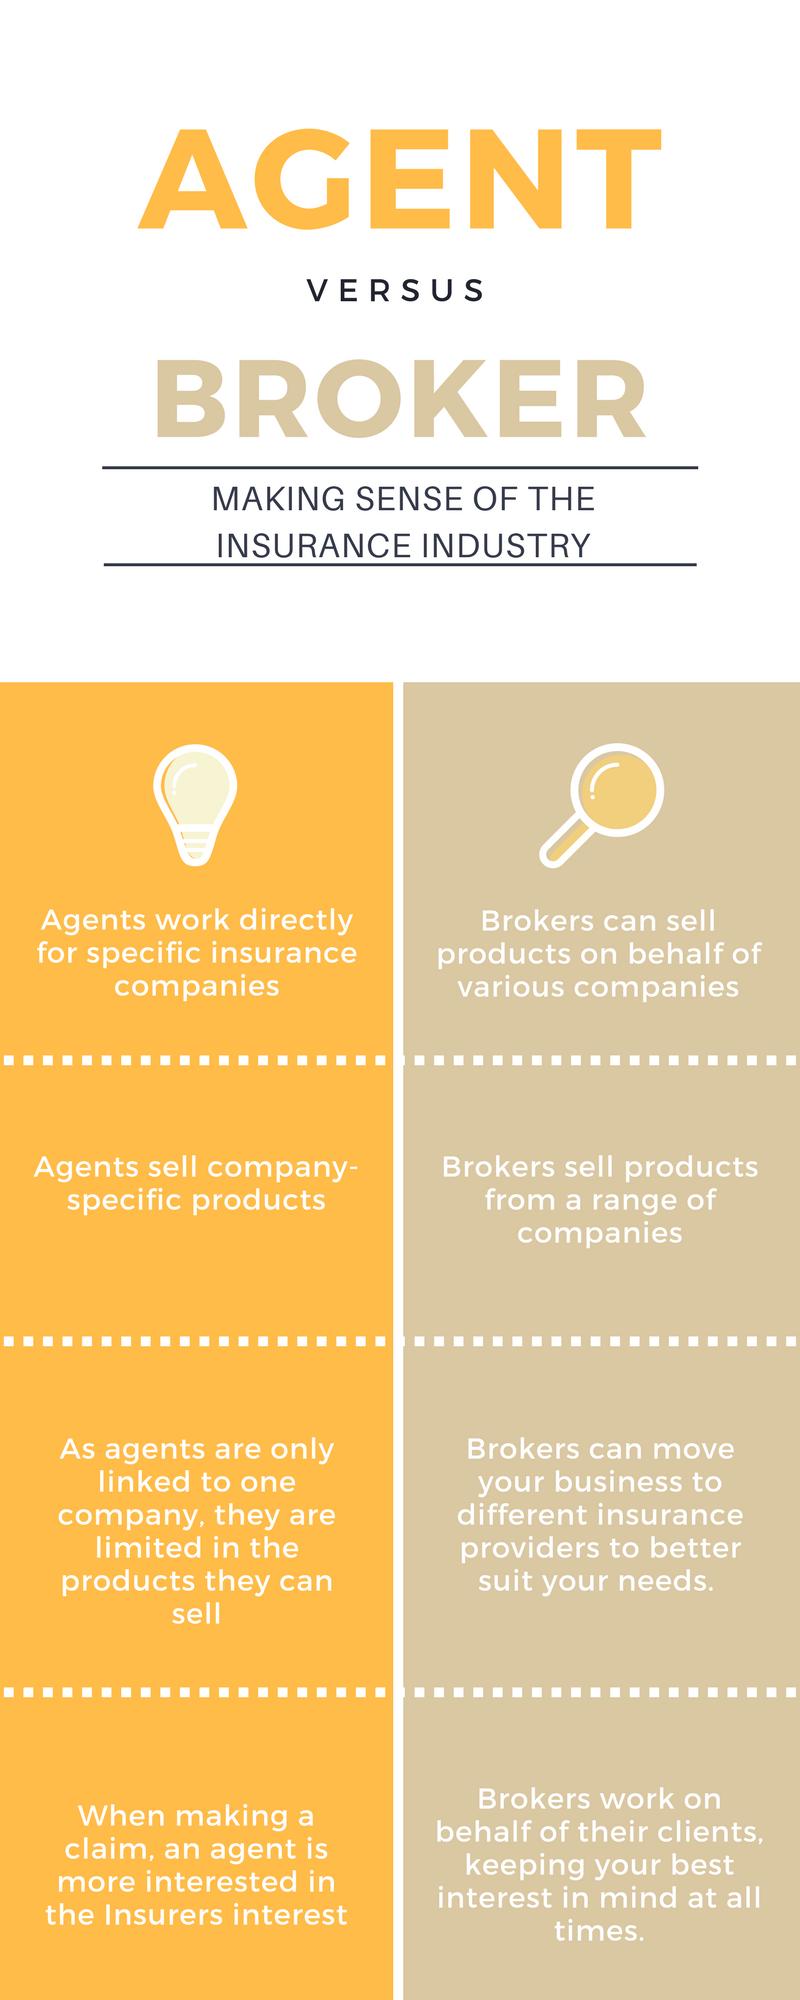 Agent vs Broker